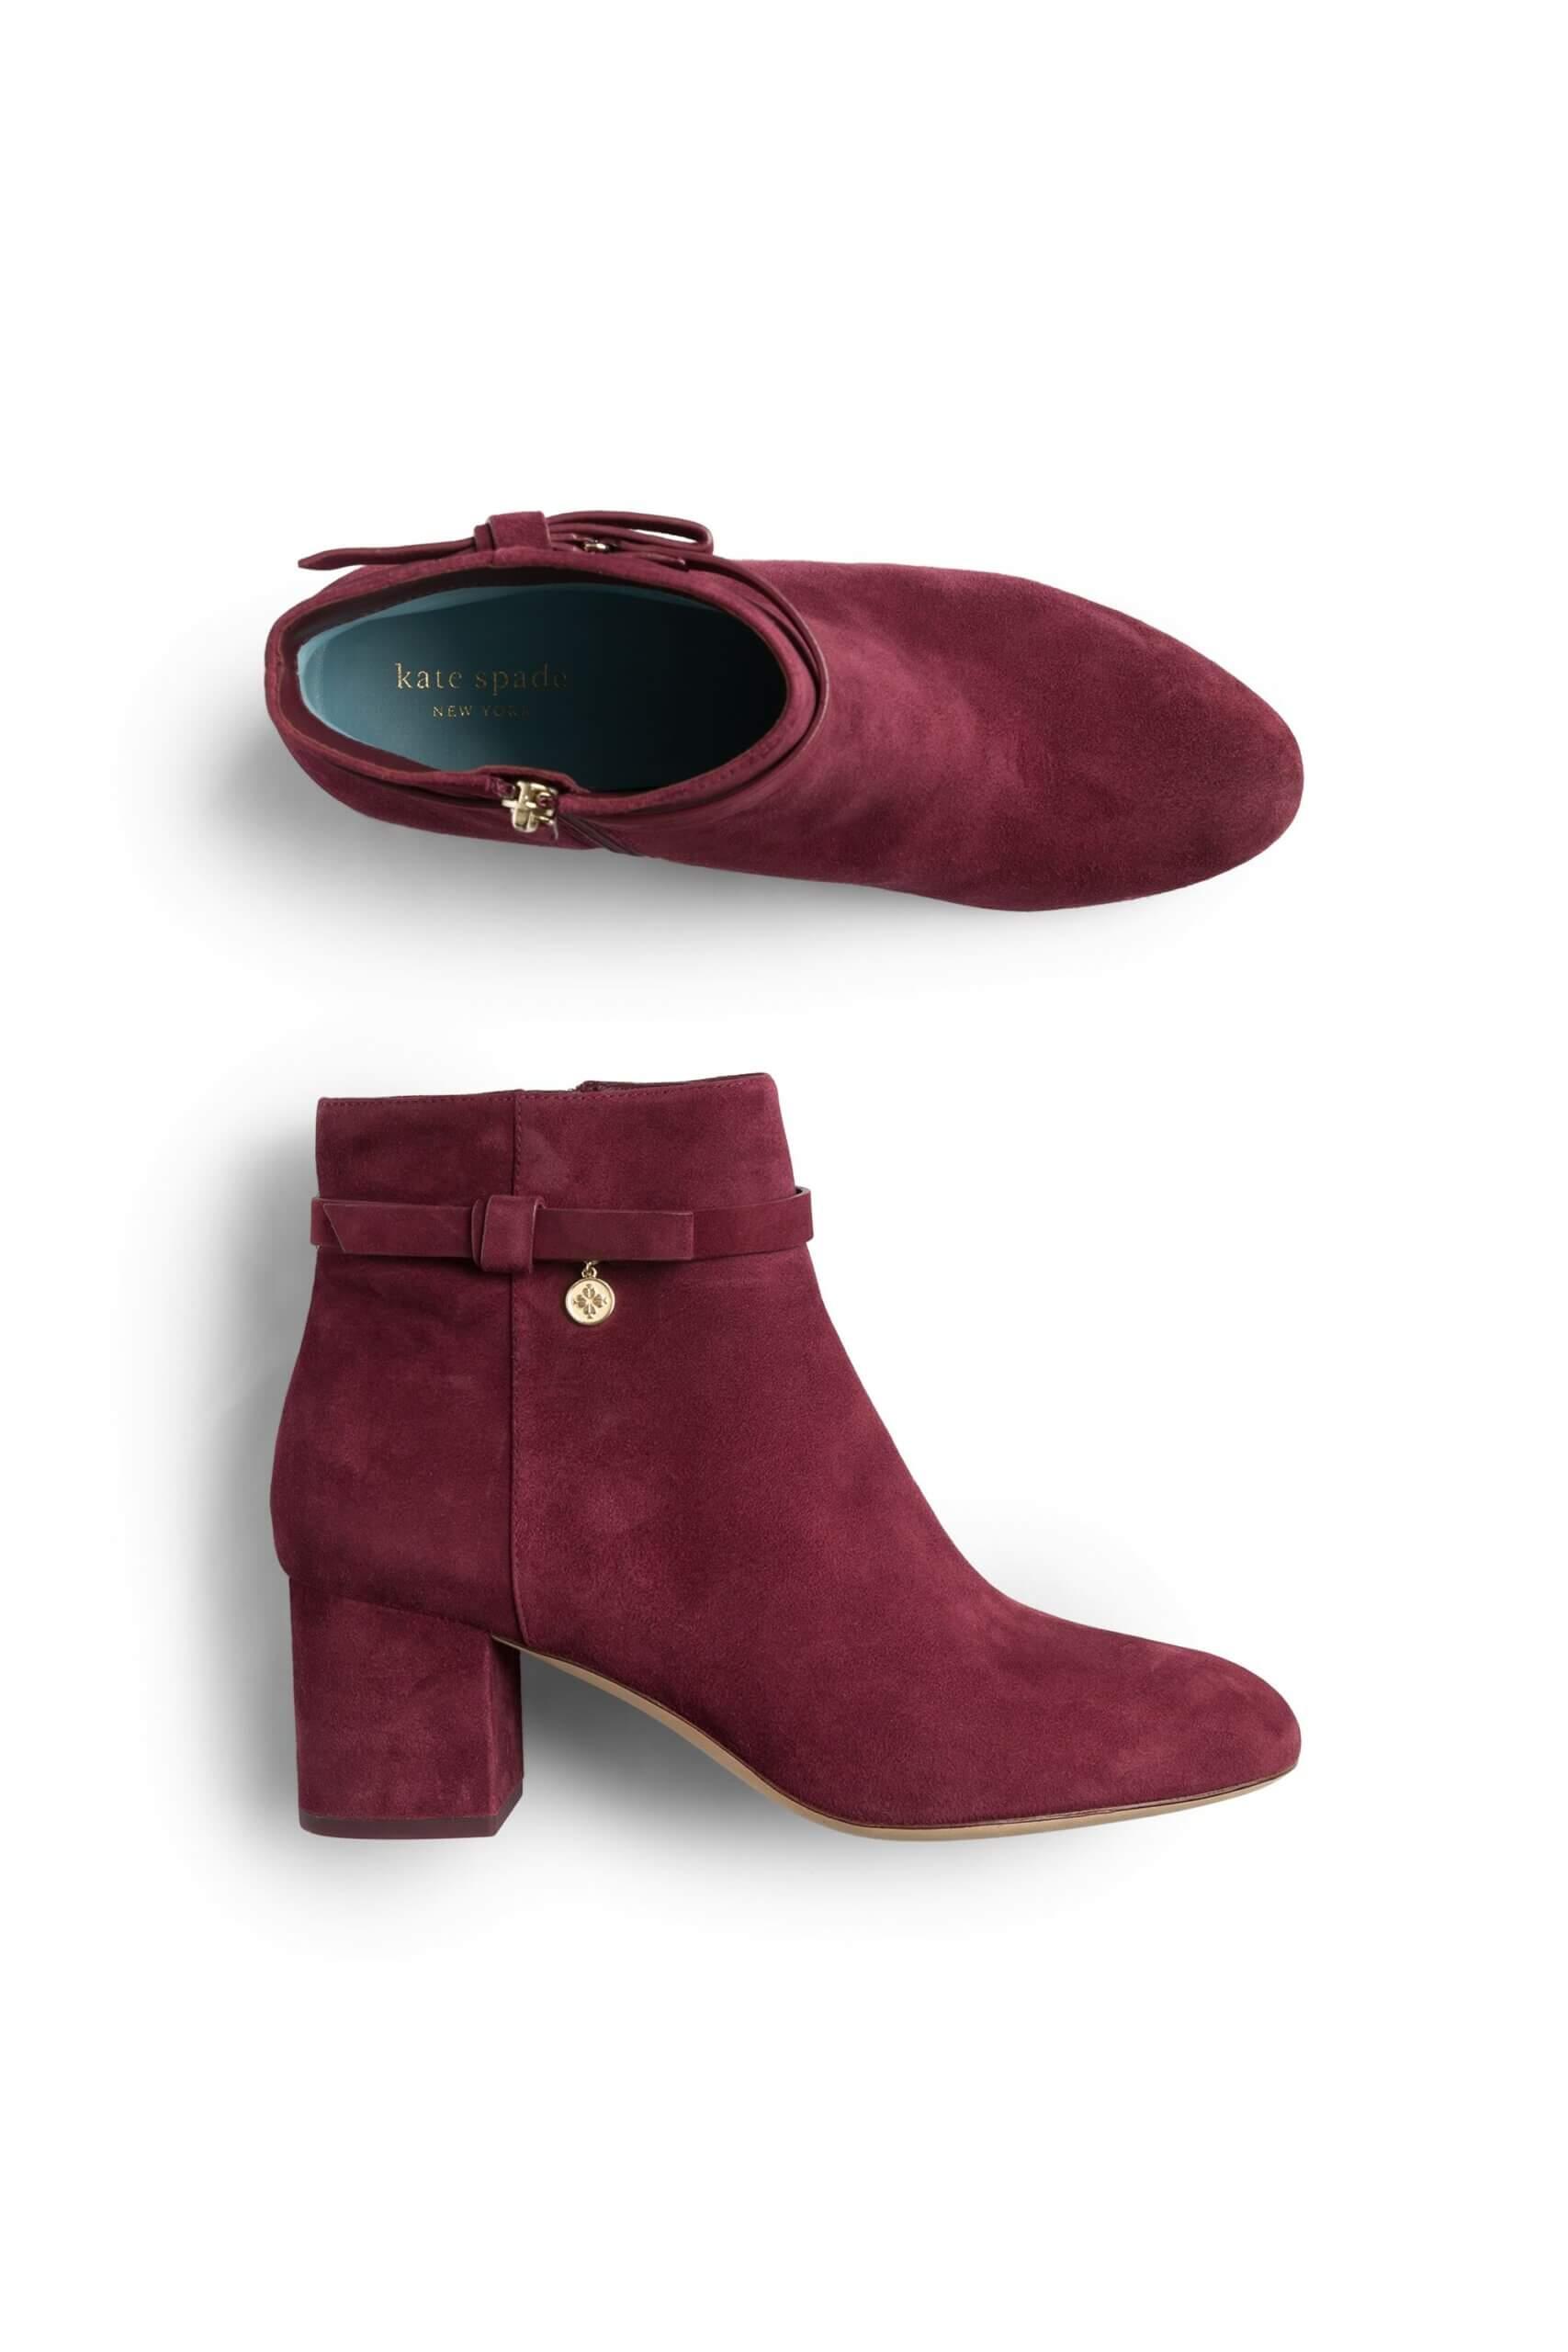 Stitch Fix women's burgundy heeled booties.